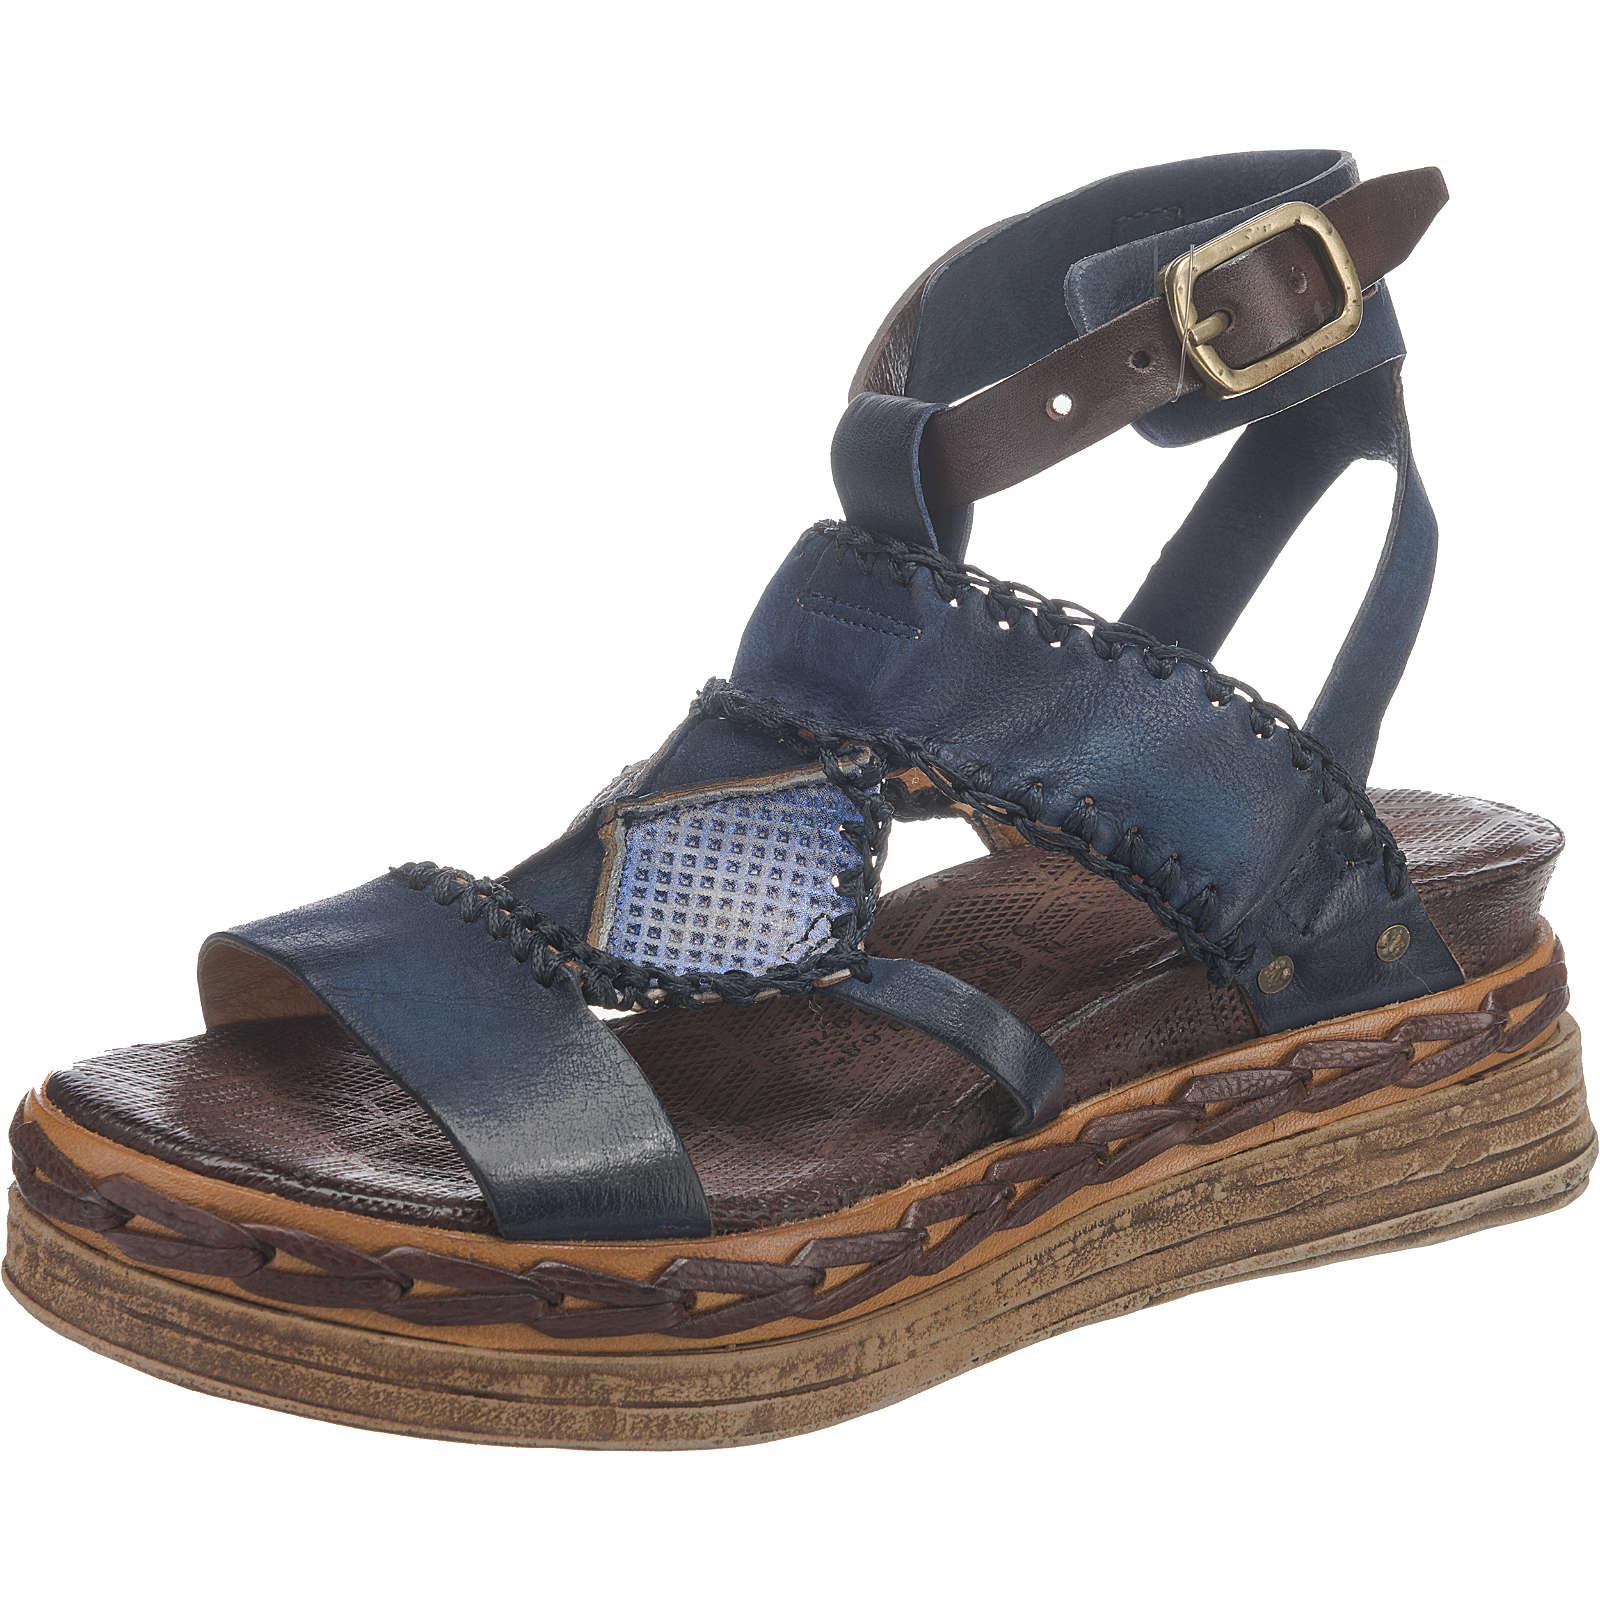 A.S.98 Klassische Sandaletten dunkelblau Damen Gr. 36